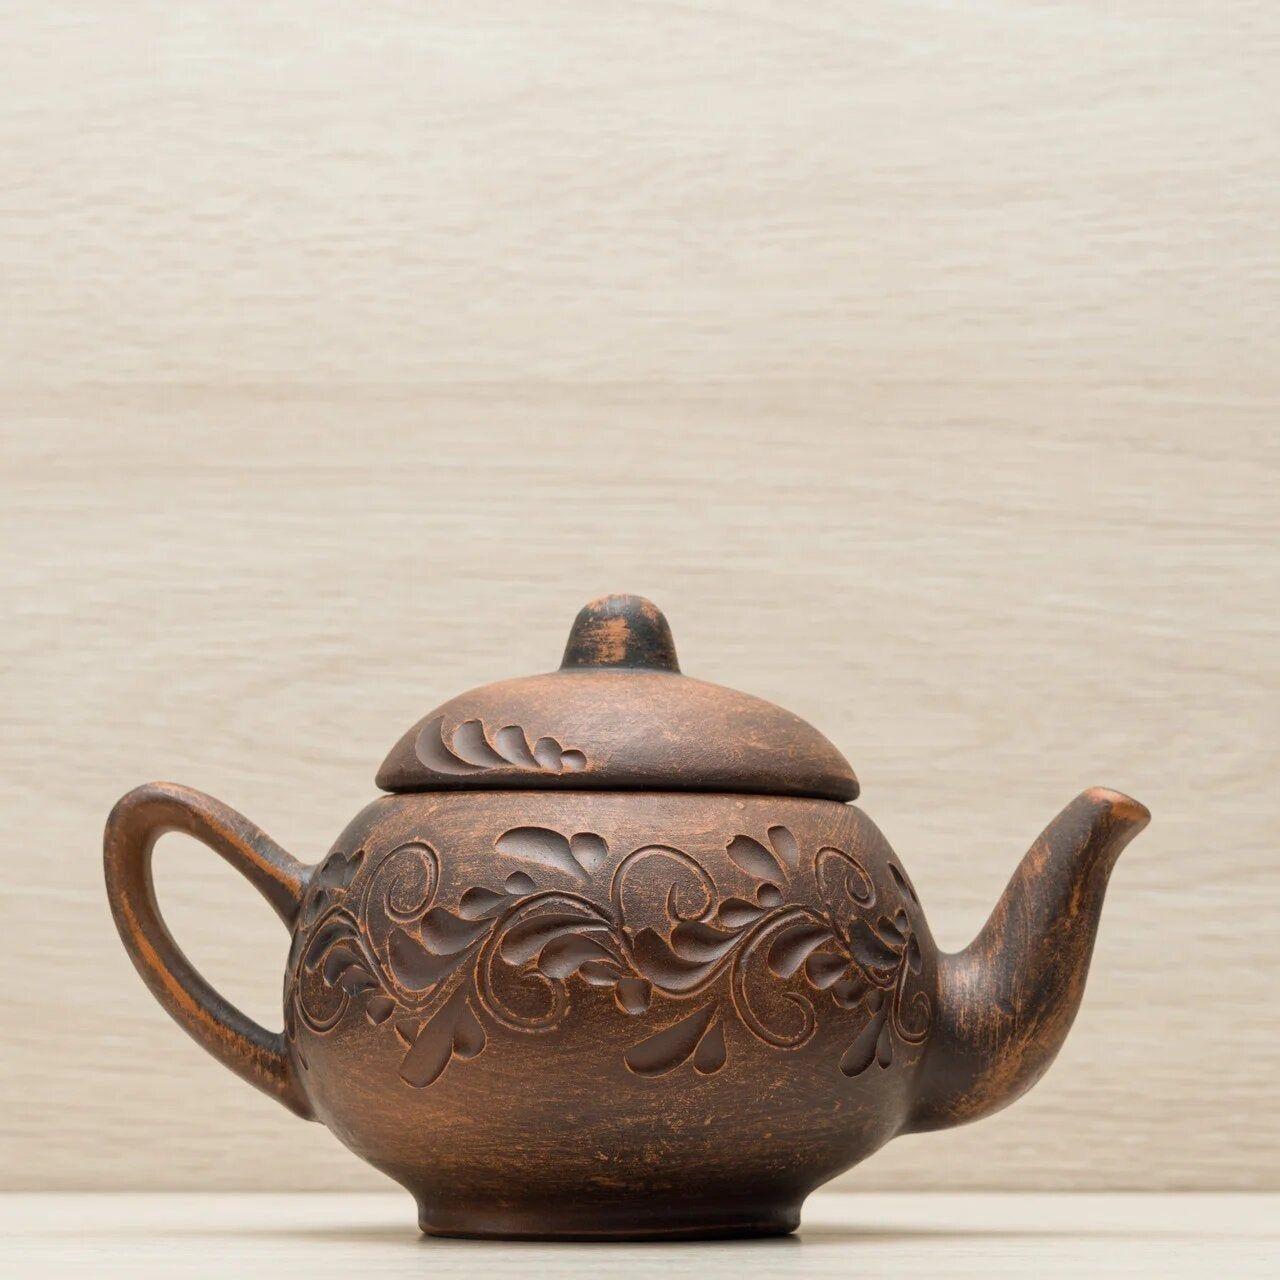 Pottery Teapot Clay Teapot Rustic Teapot Kettle For Tea Etsy In 2020 Pottery Teapots Clay Teapots Tea Pots